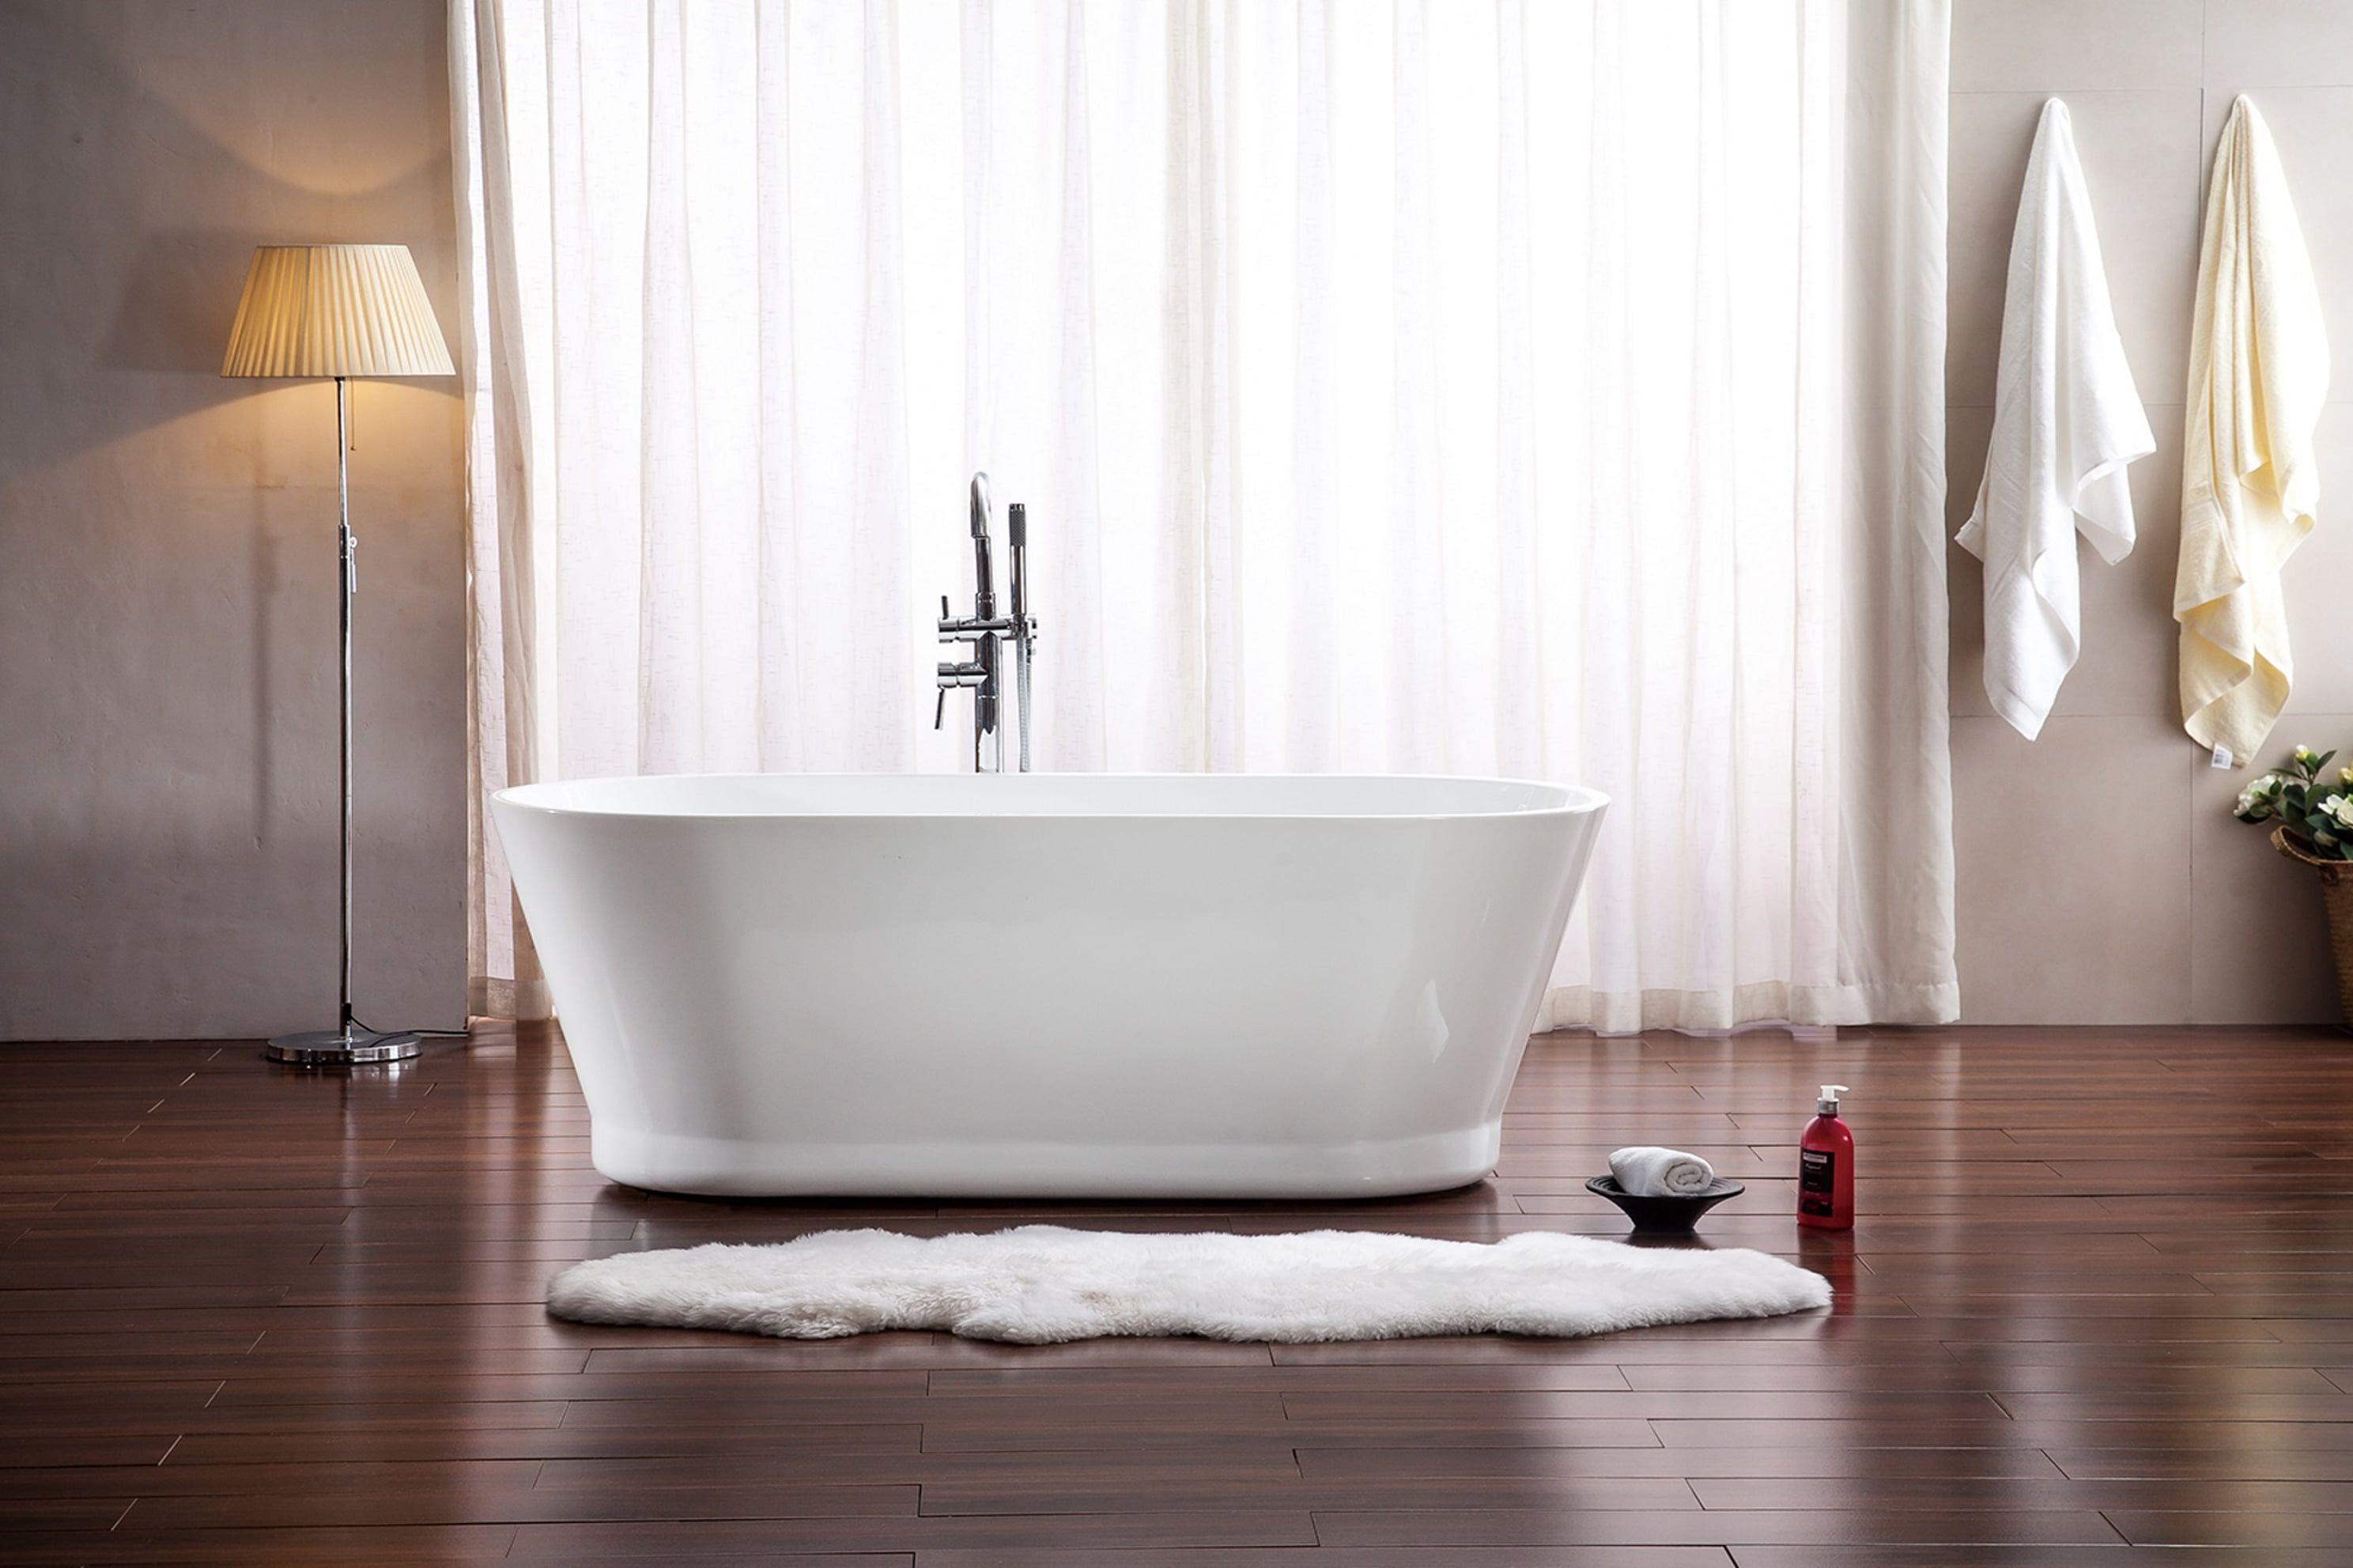 Ideal Retro Badkar Bathlife  Frist Ende - Trademaxse